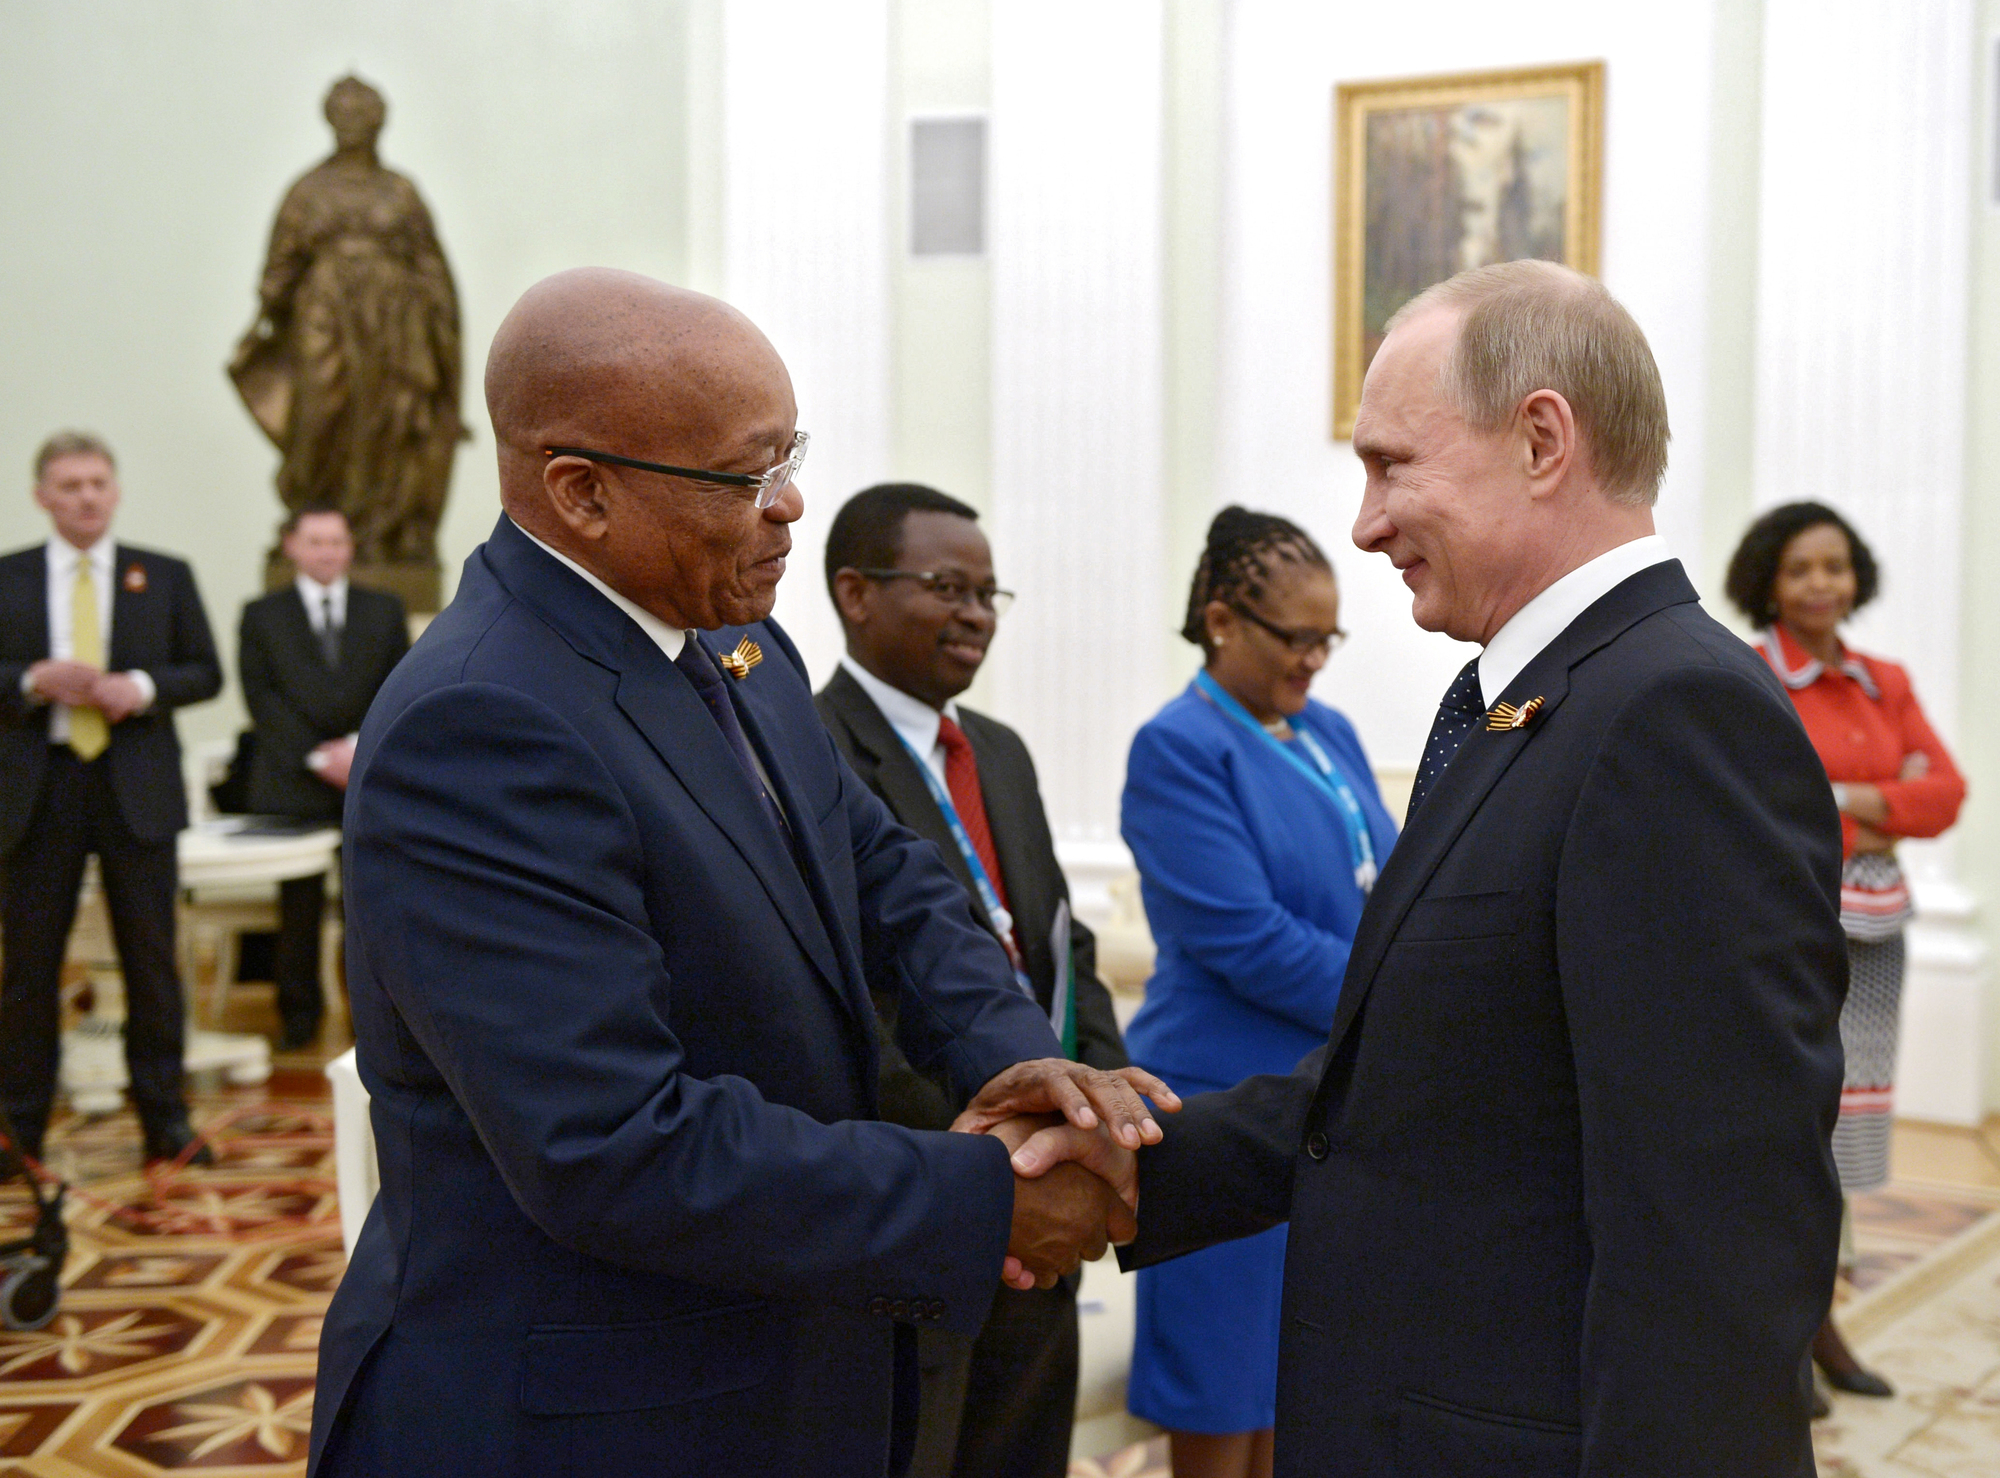 Moscou,9mai 2015: Vladimir Poutine reçoit Jacob Zuma,son homologue sud-africain.